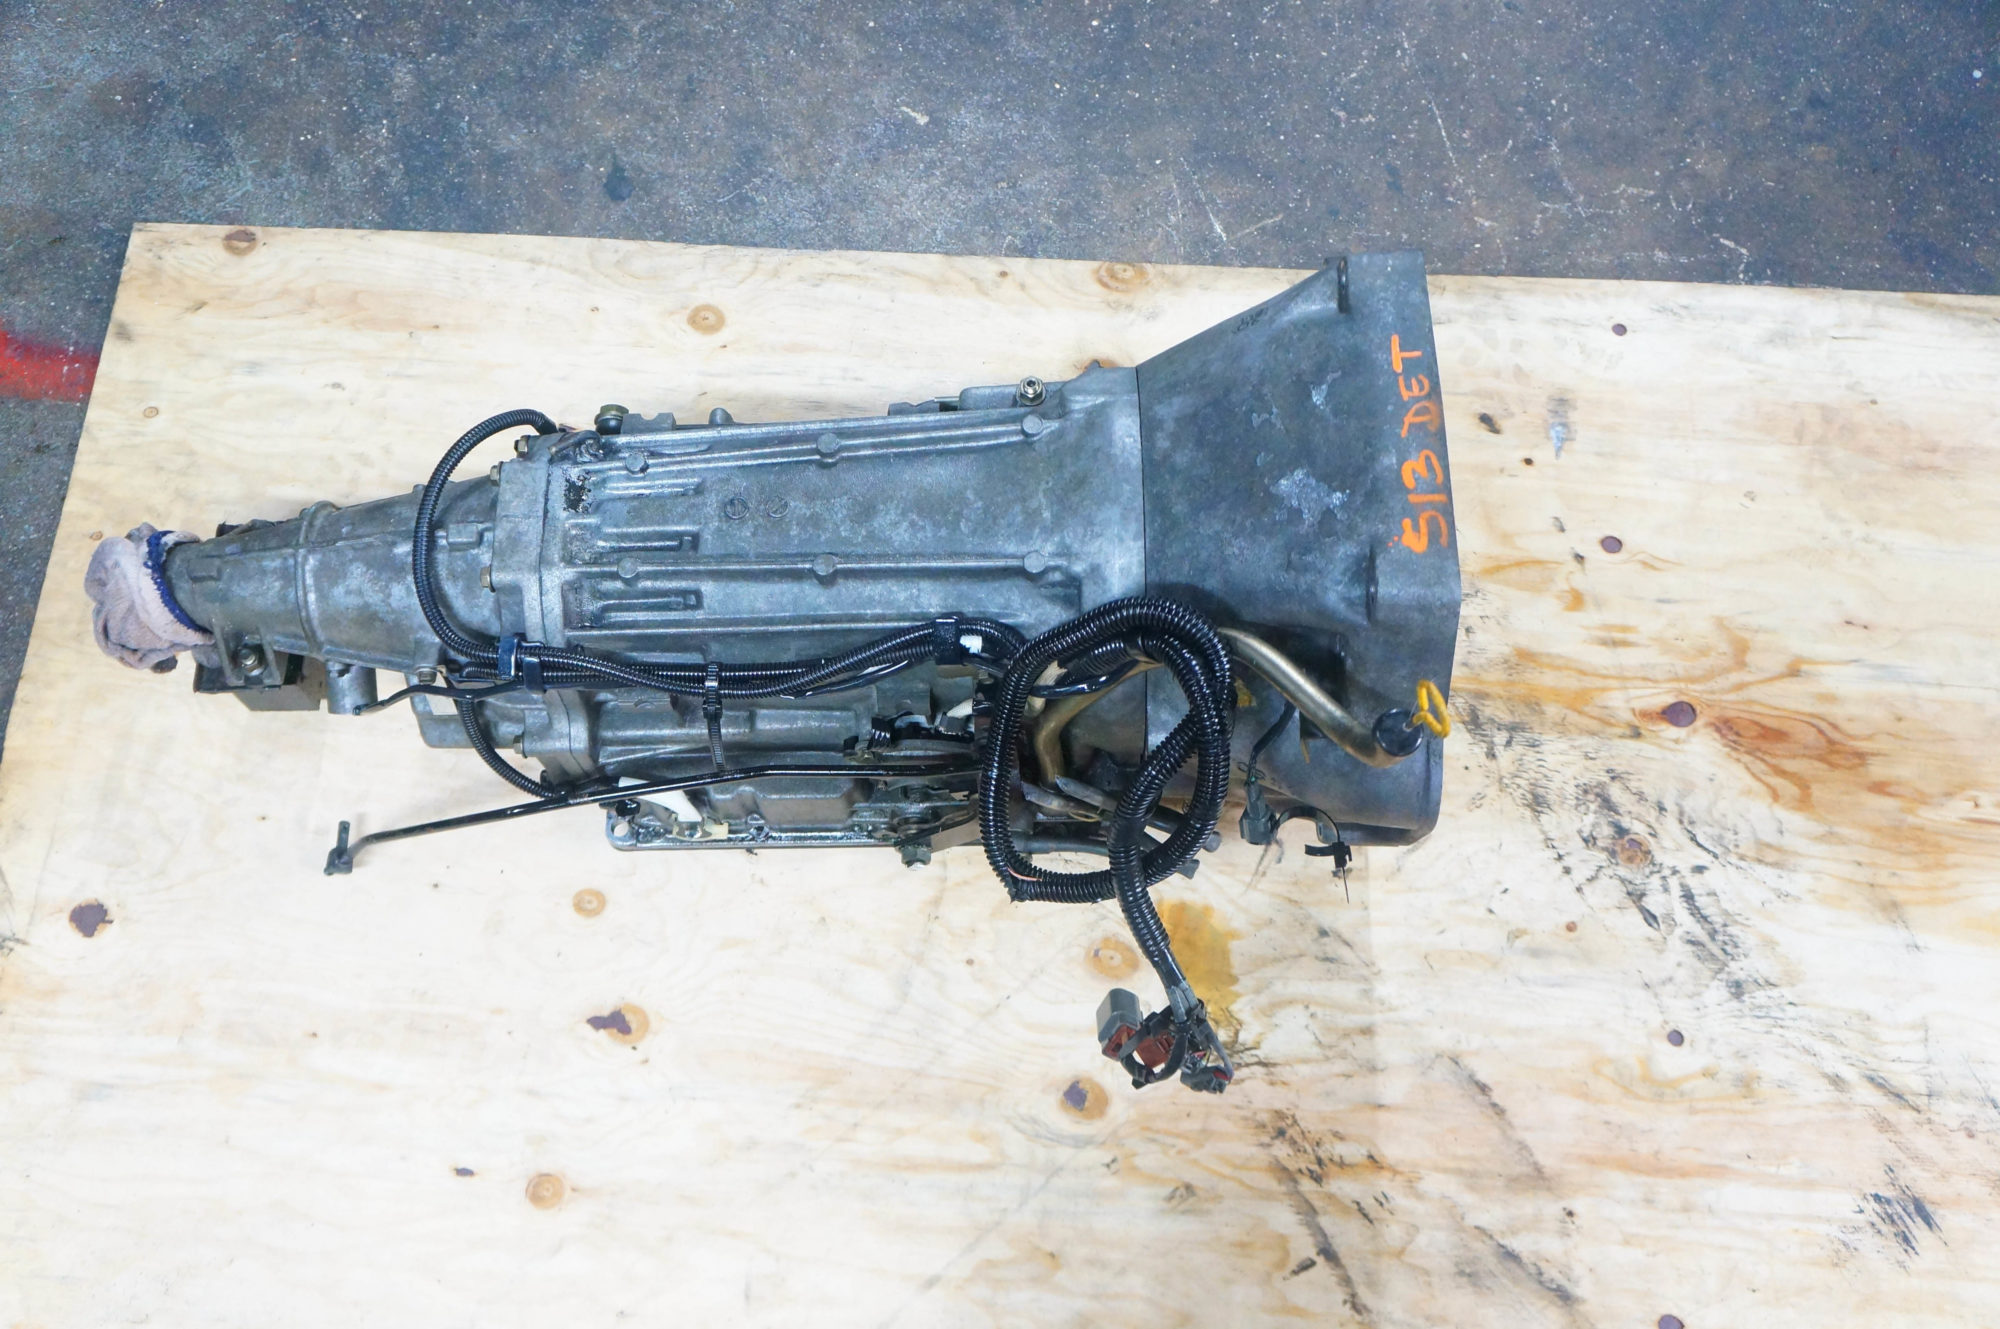 JDM NISSAN S13DET AUTOMATIC TRANSMISSION